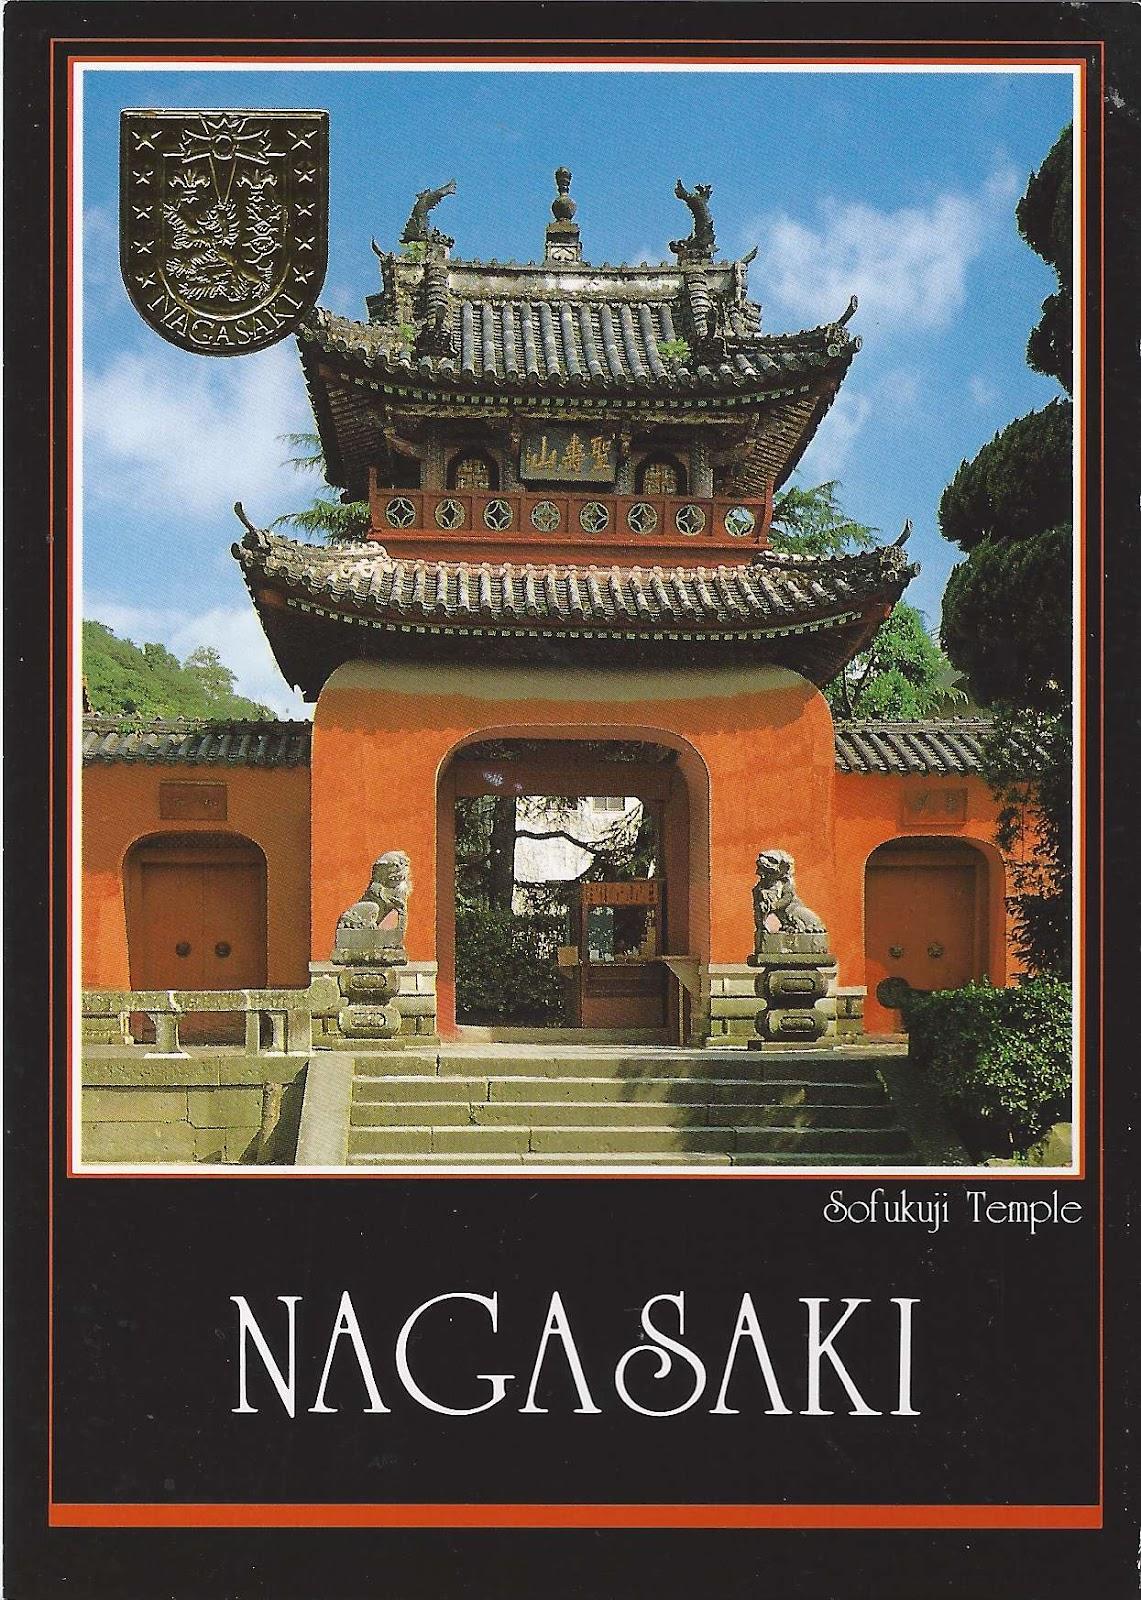 A Journey Of Postcards: Sofukuji Temple In Nagasaki